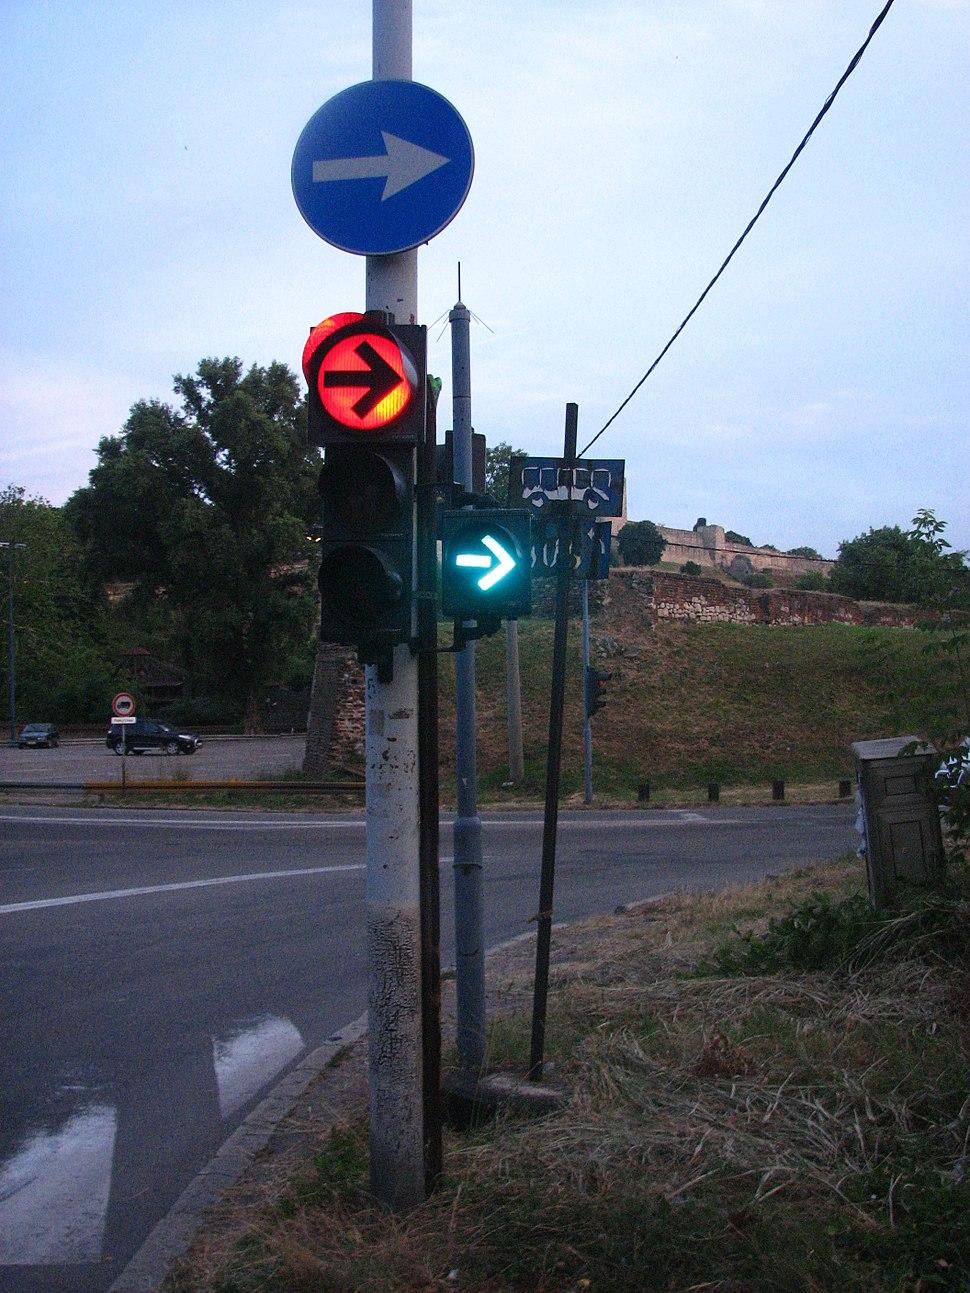 Right turn on red Belgrade, Serbia